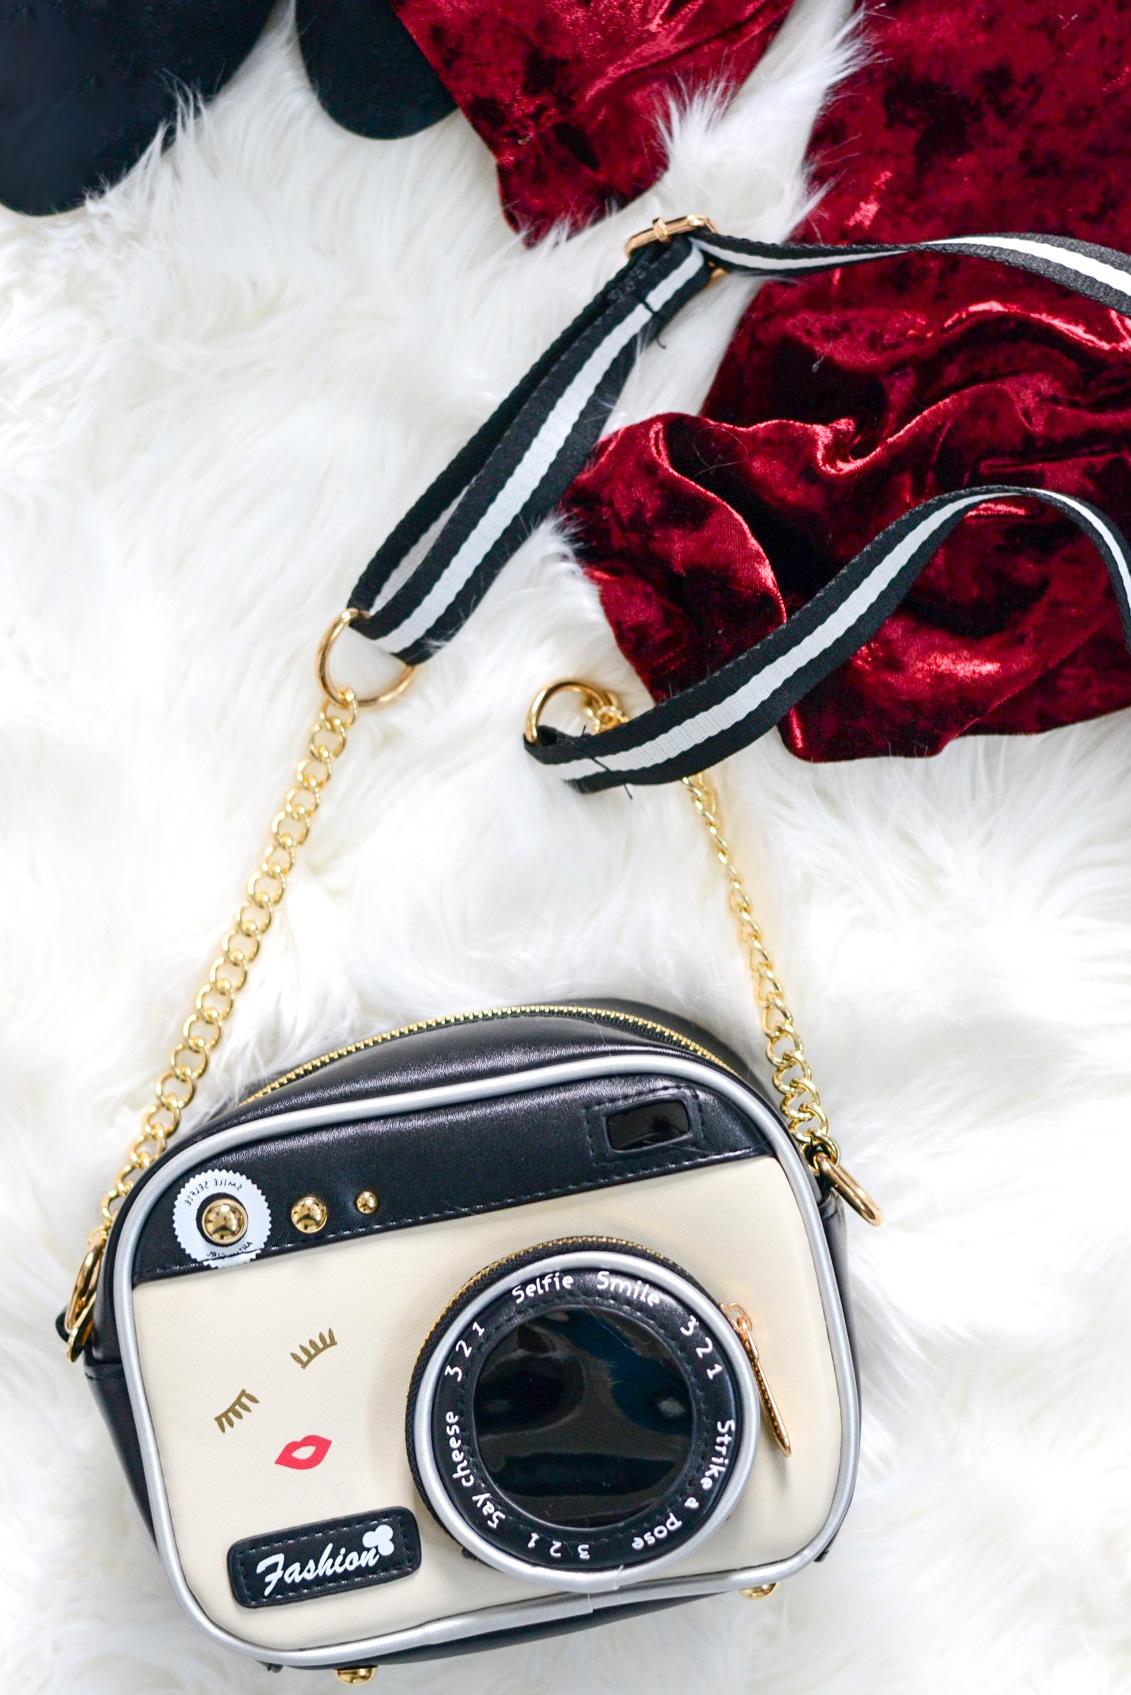 A Few Quick Gift Ideas for Girly Girls- Zaful camera purse